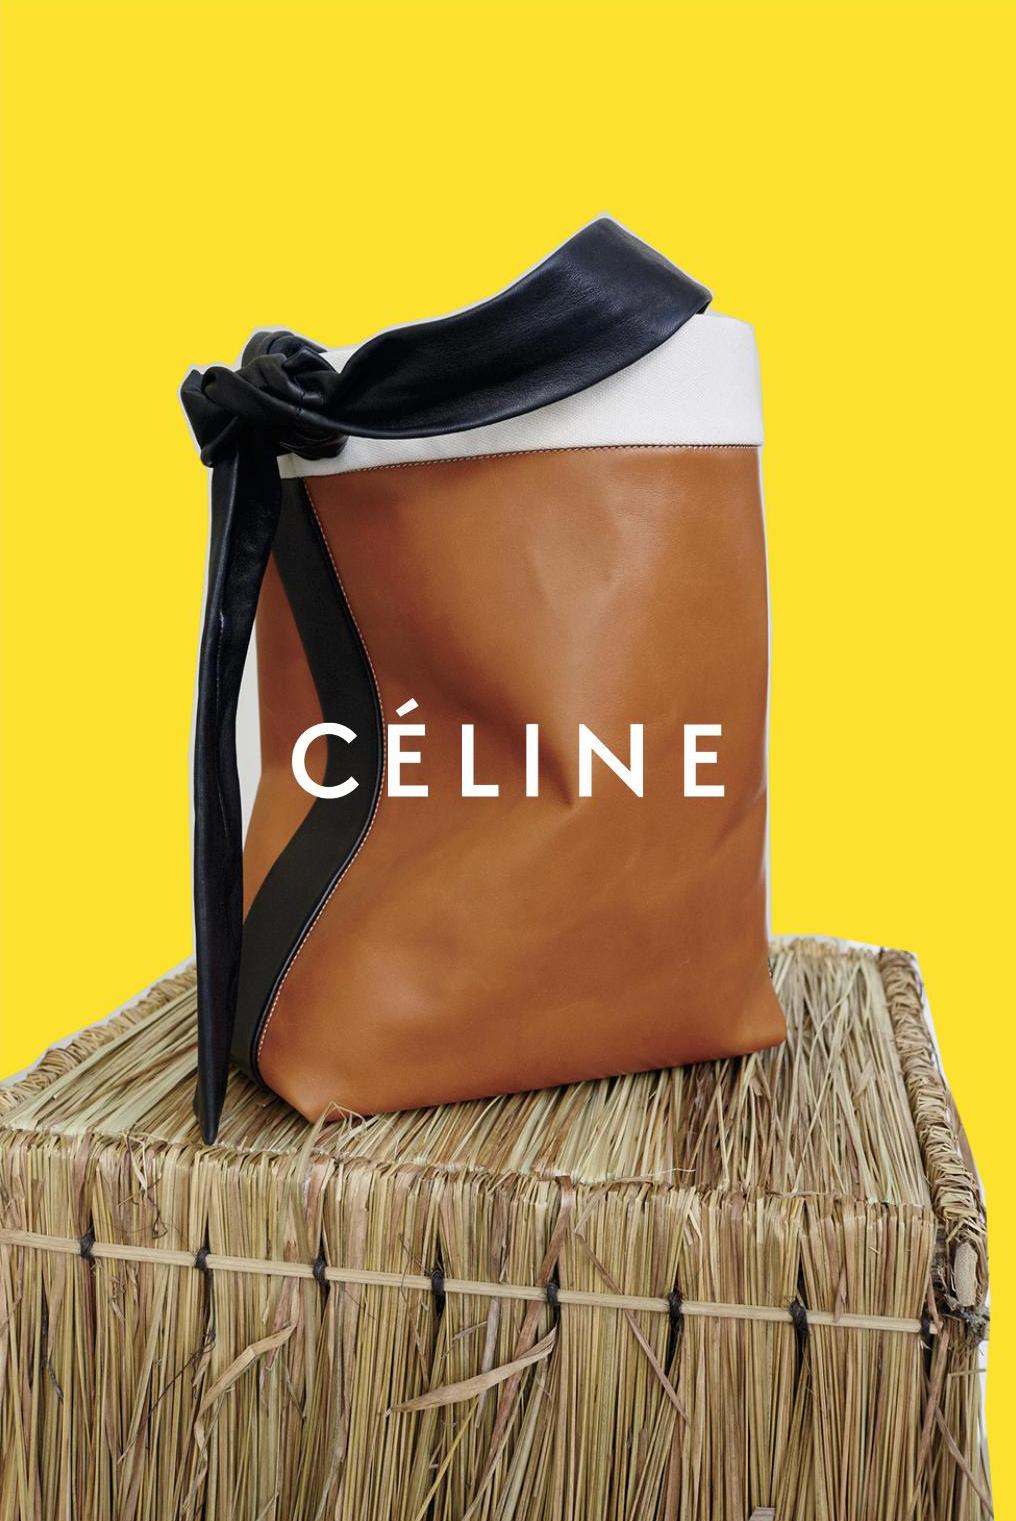 First Look: Céline Autumn/Winter 2016 Campaign